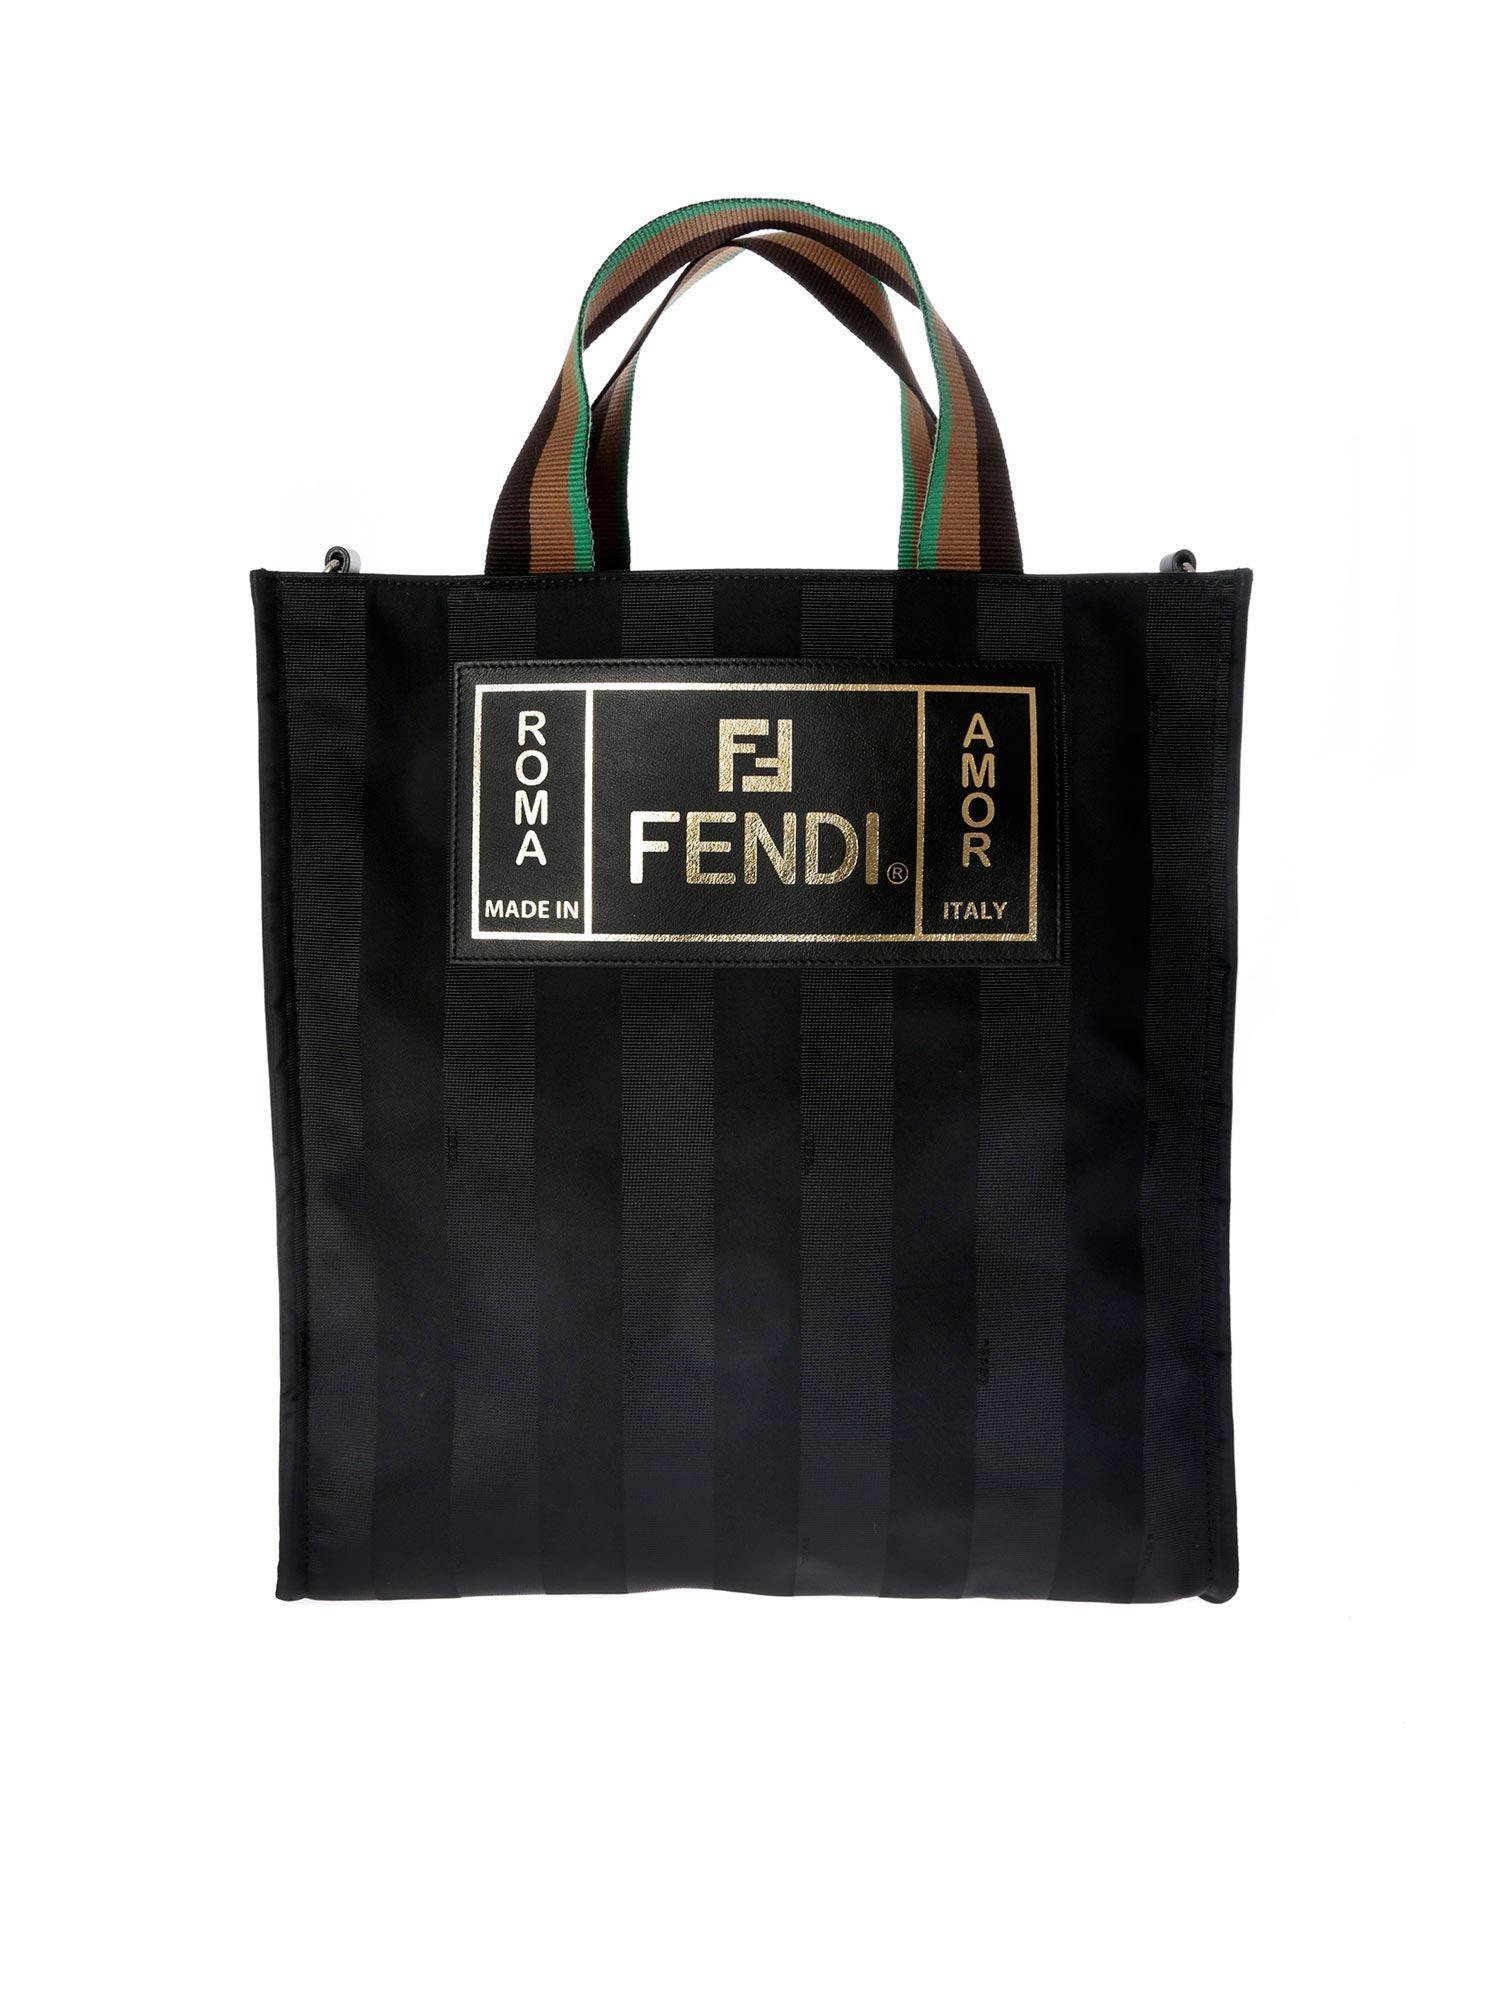 12523600c48d Lyst - Fendi Black Small Market Tote in Black for Men - Save 12%